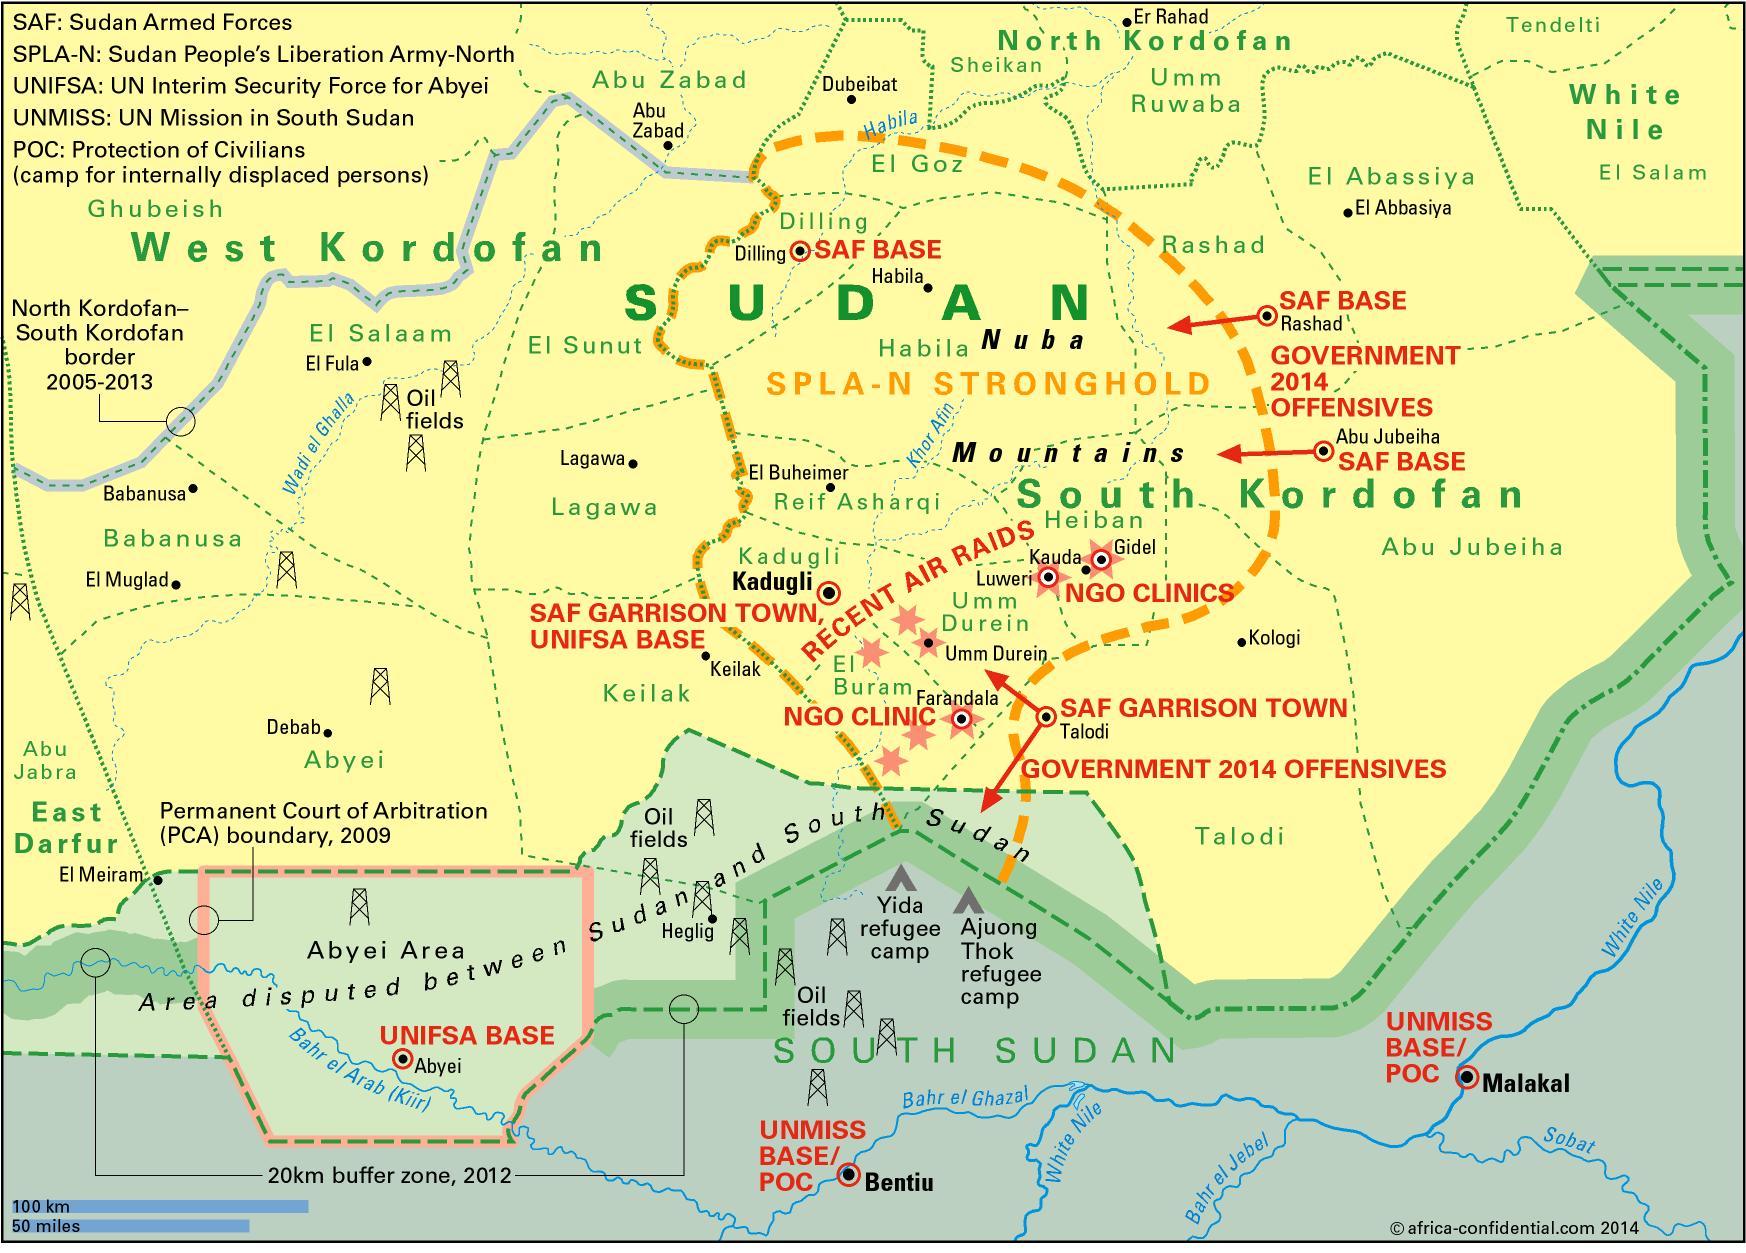 More calls for Nuba talks | Article | Africa Confidential